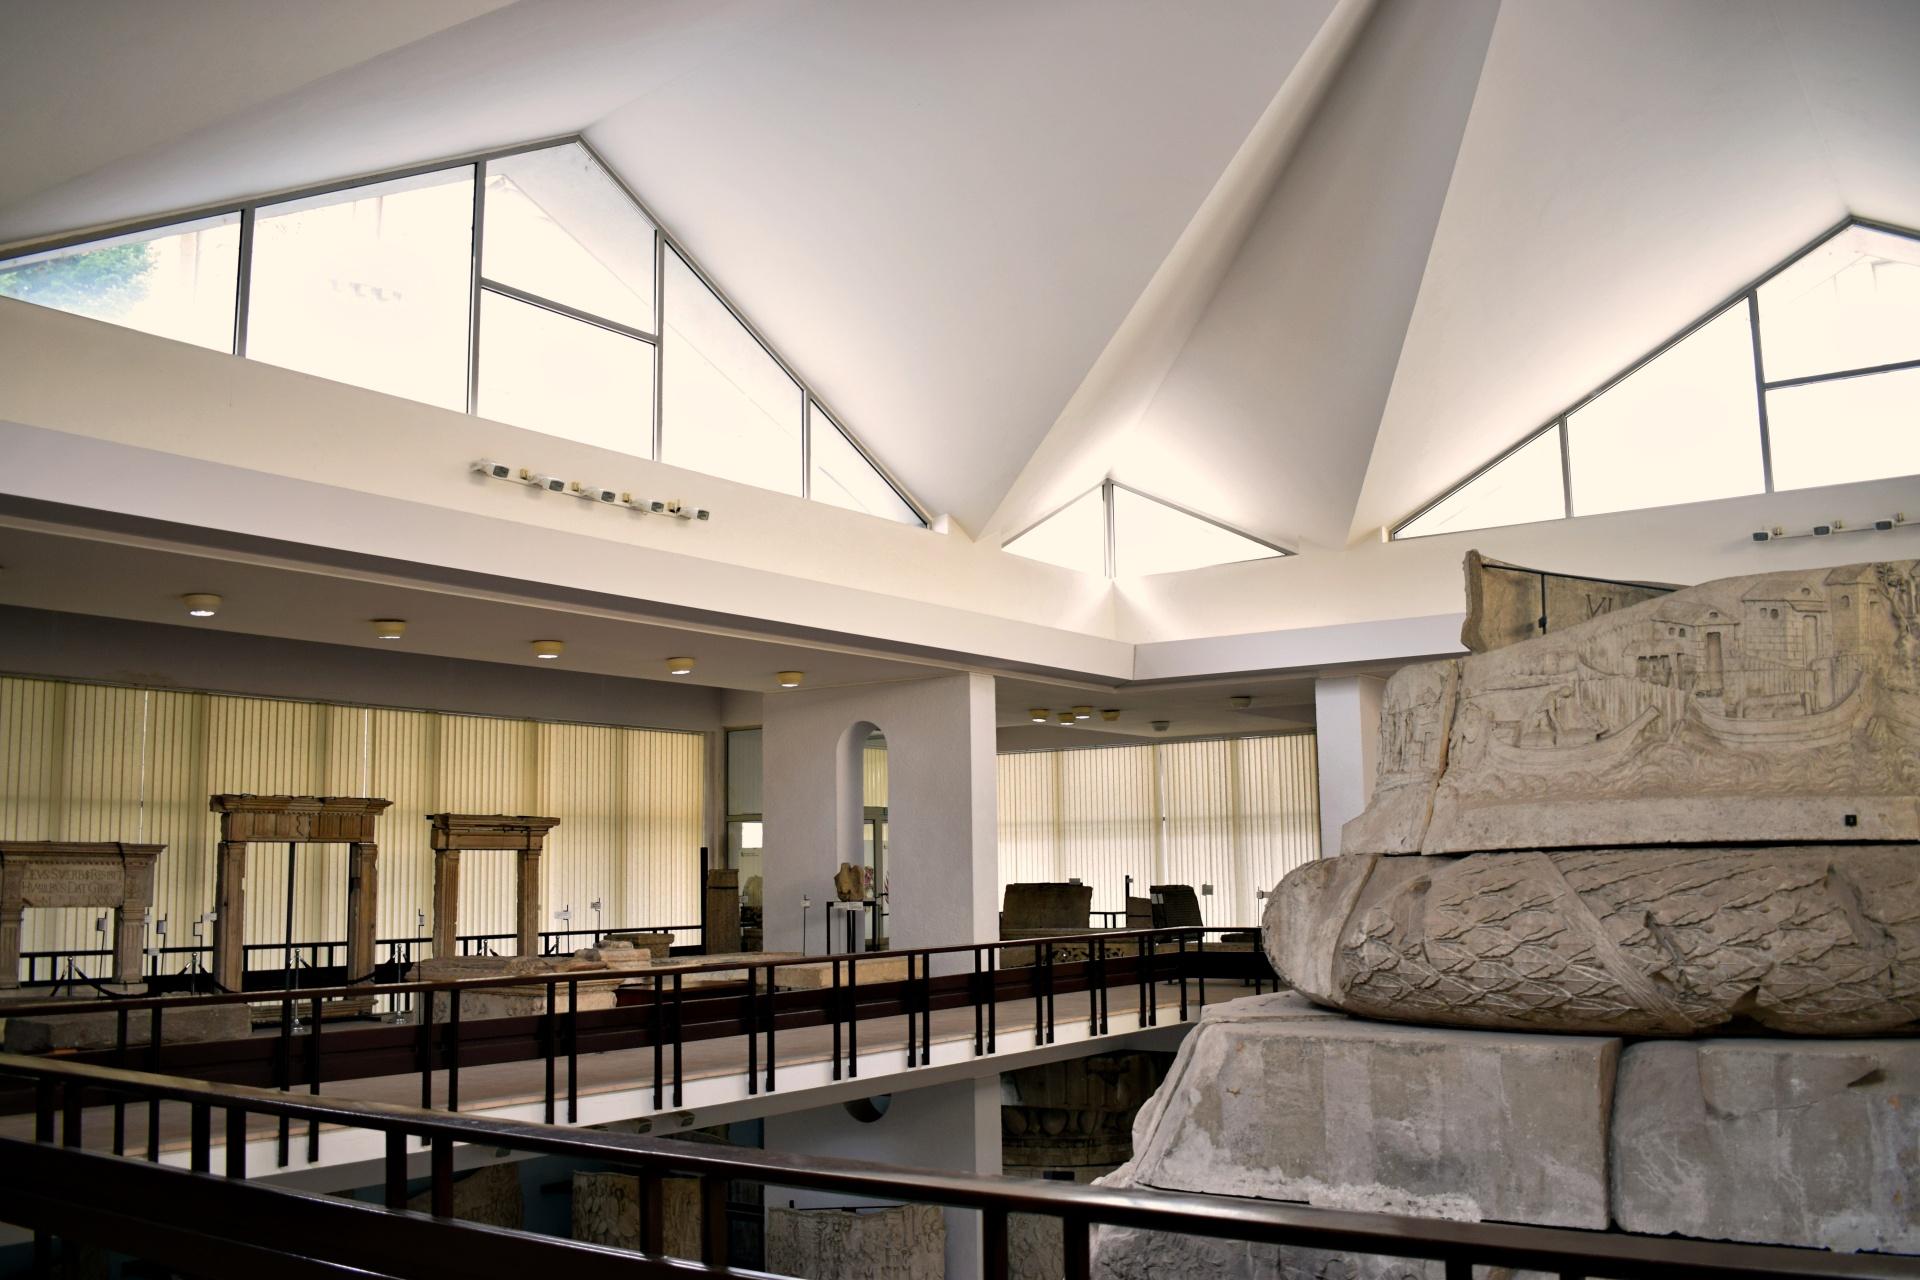 vany visits_bukarest_nationalmuseum 2